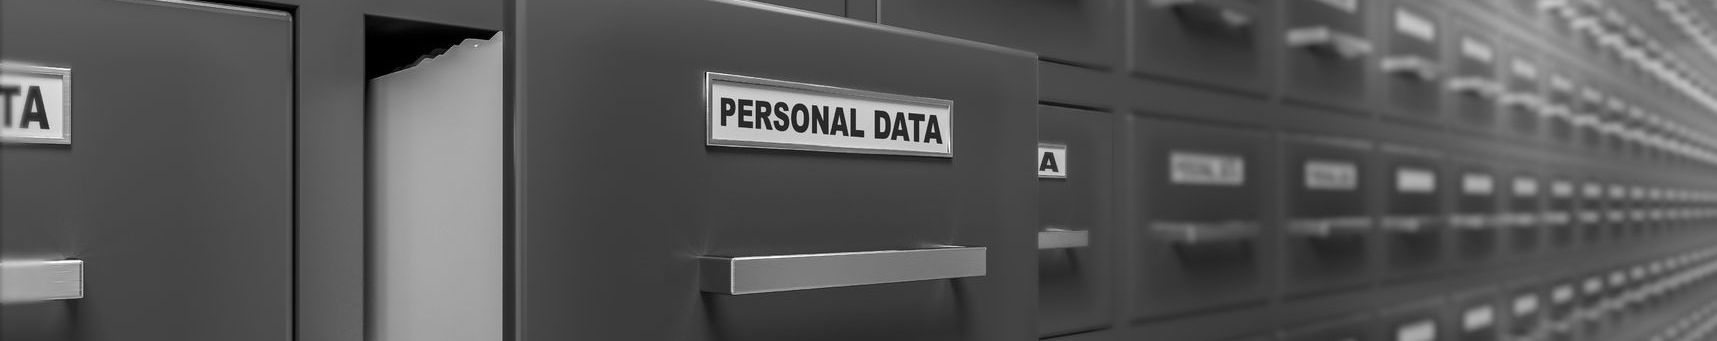 Van Os Marketing - Privacywet - AVG - blog3-Data-opslag